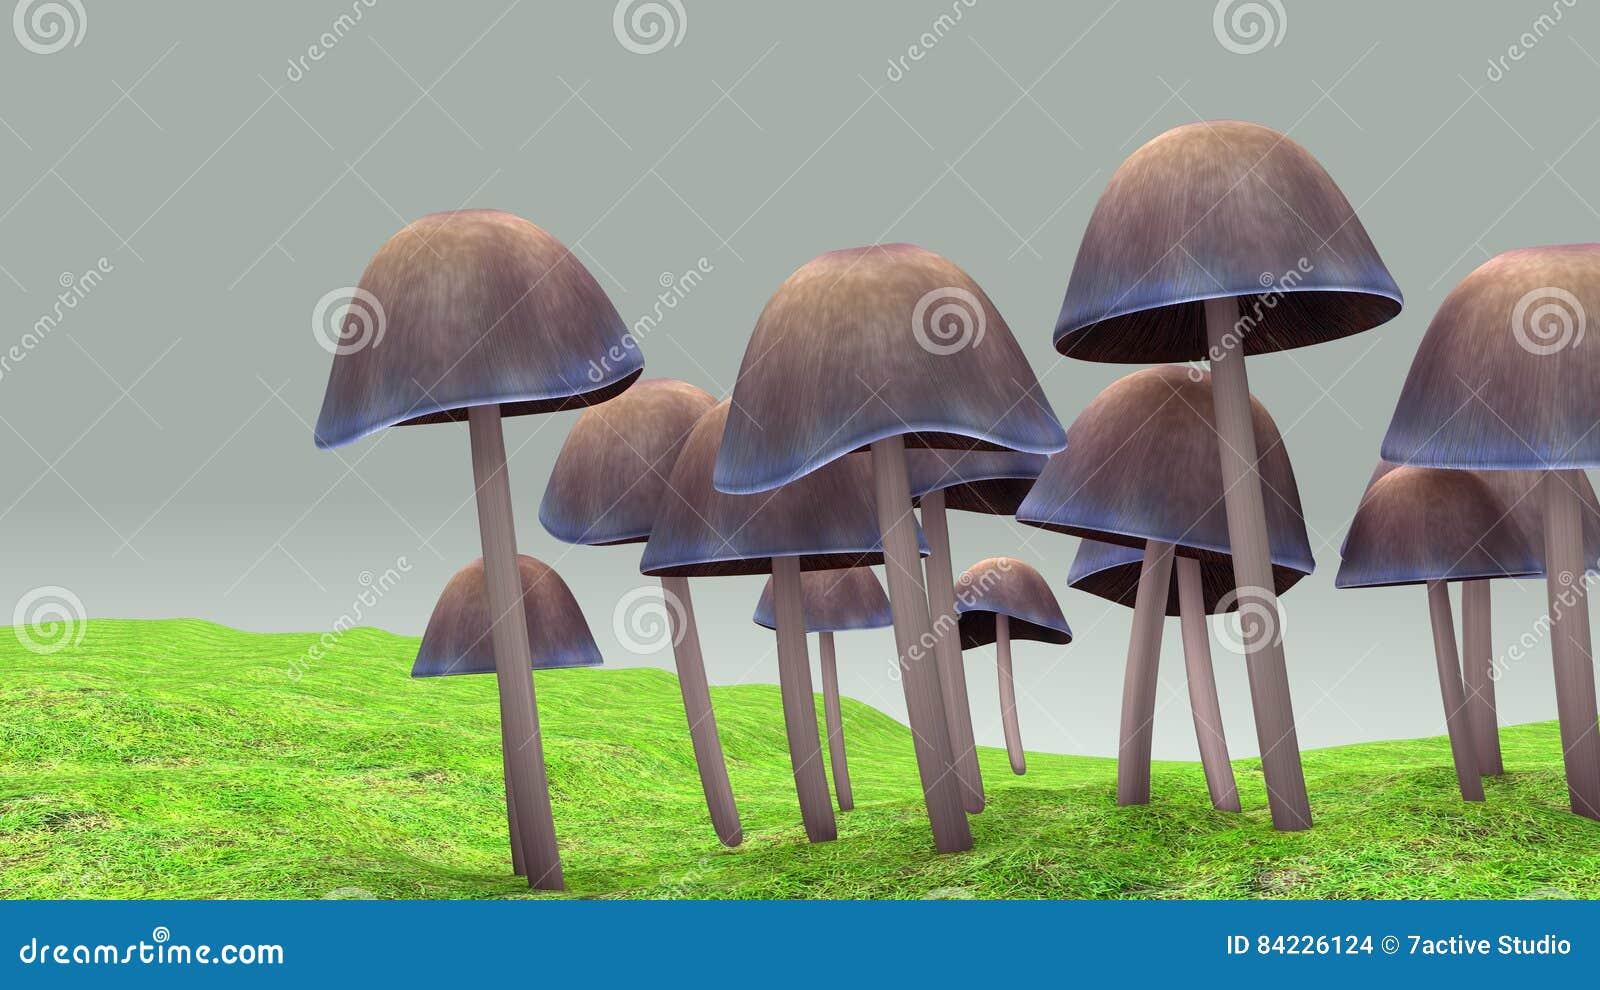 Mushroom stock illustration  Illustration of organic - 84226124